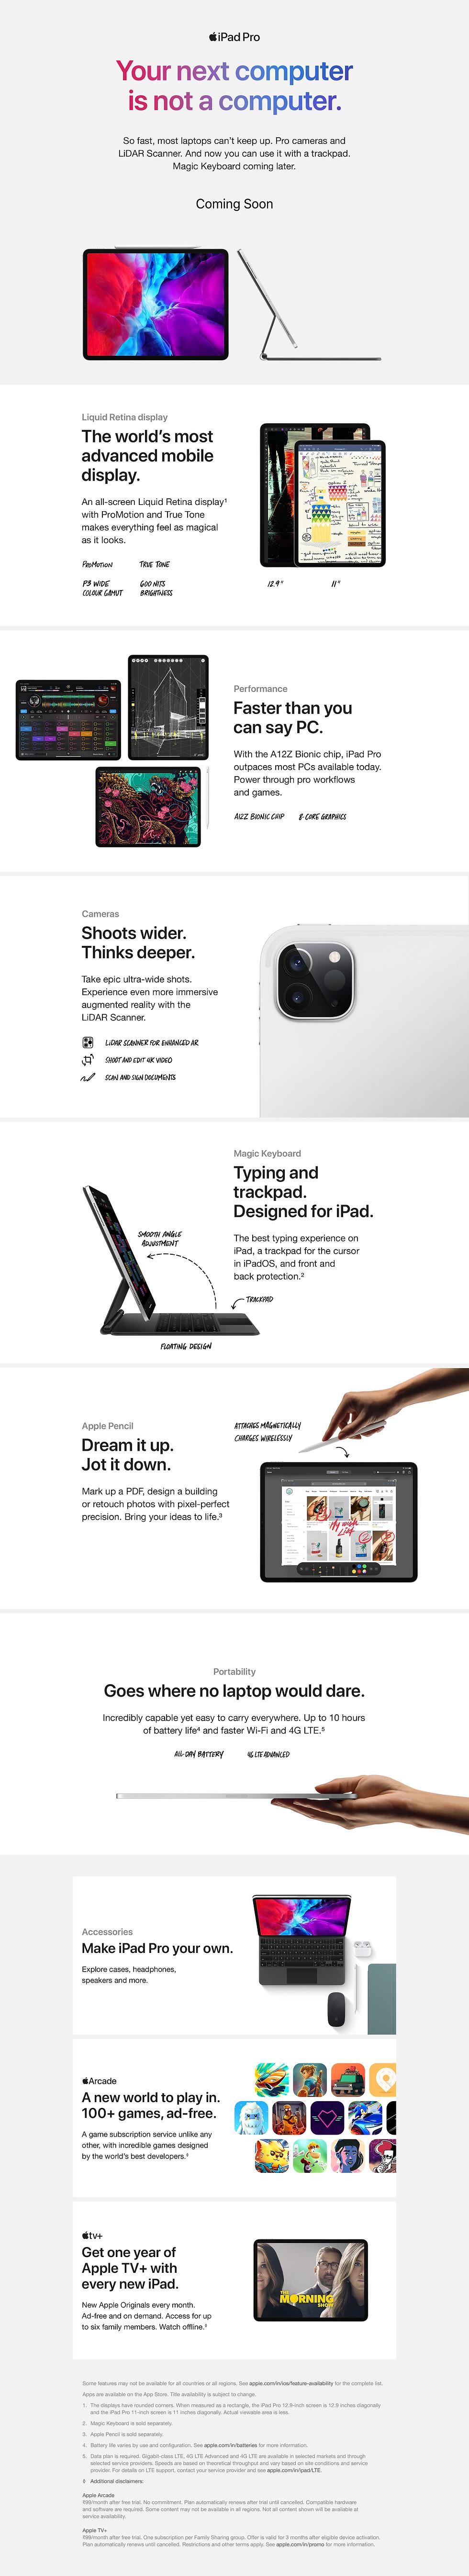 iPad Pro Product Page.JPG